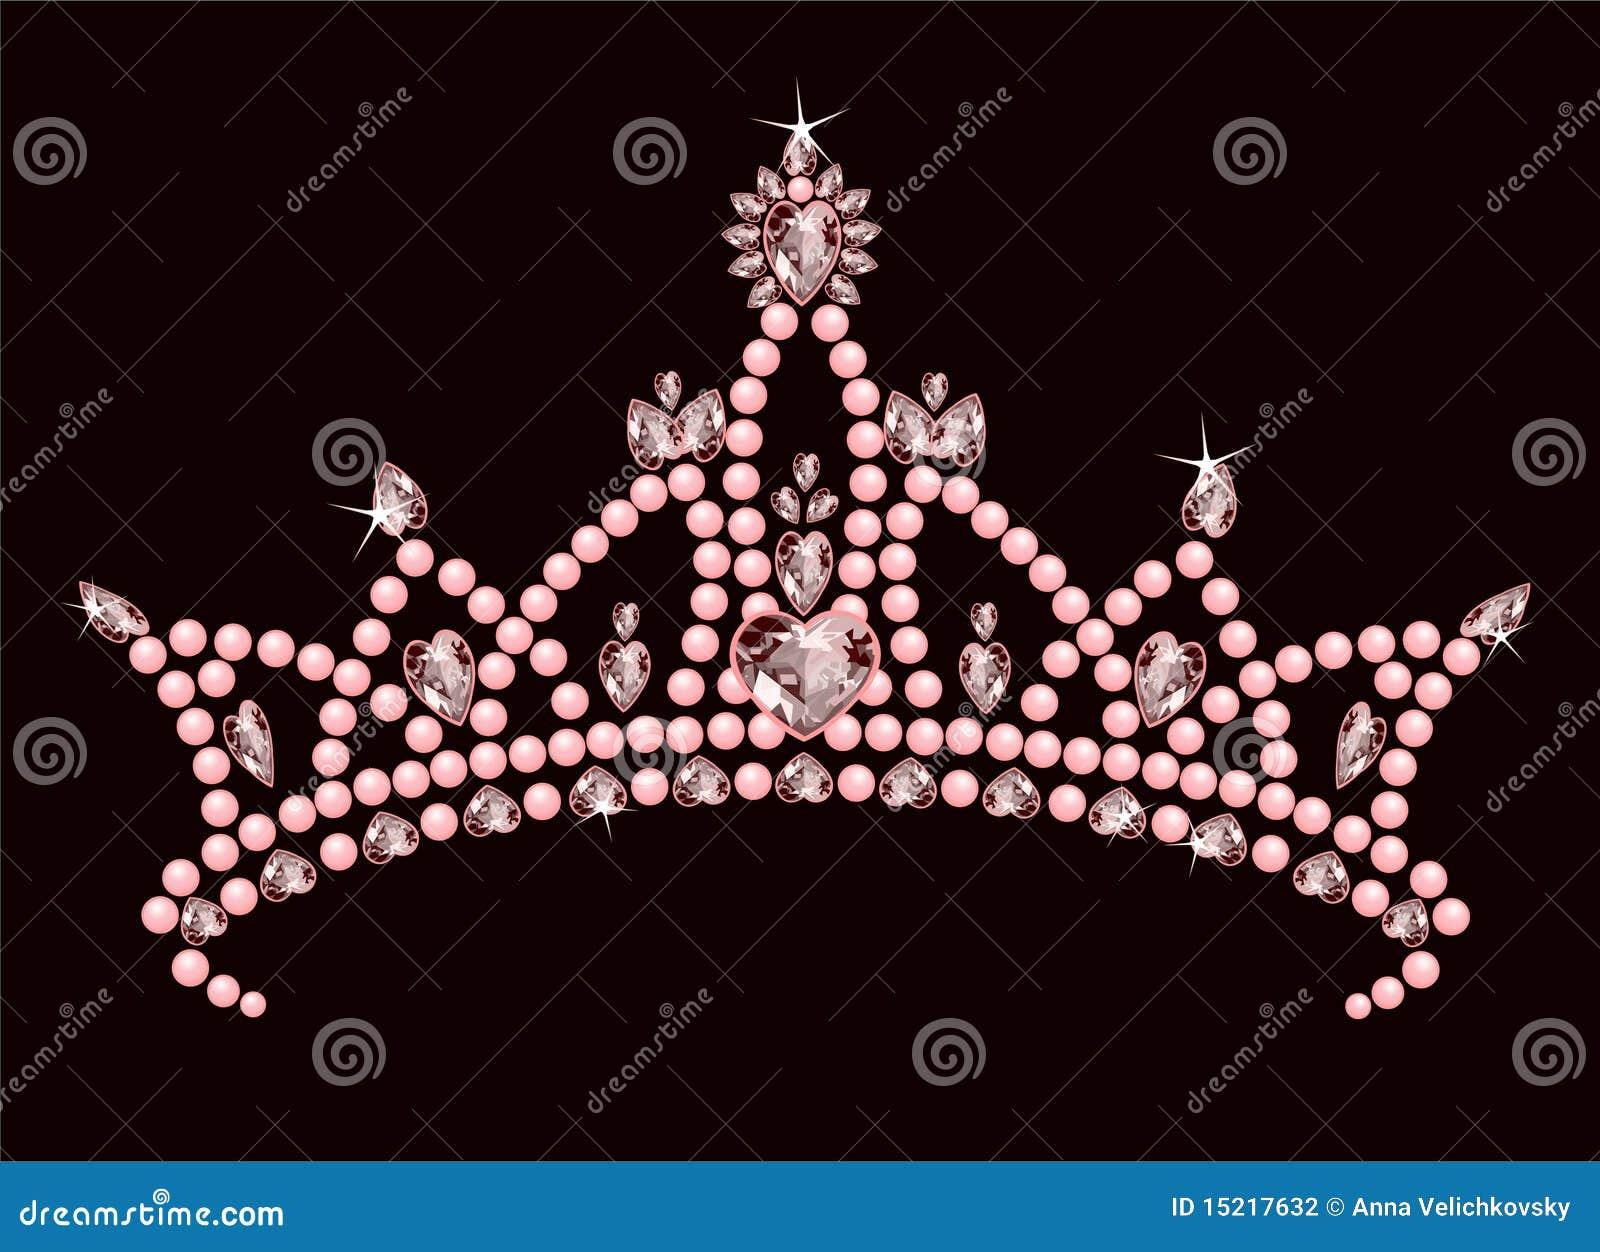 Princesa Crown